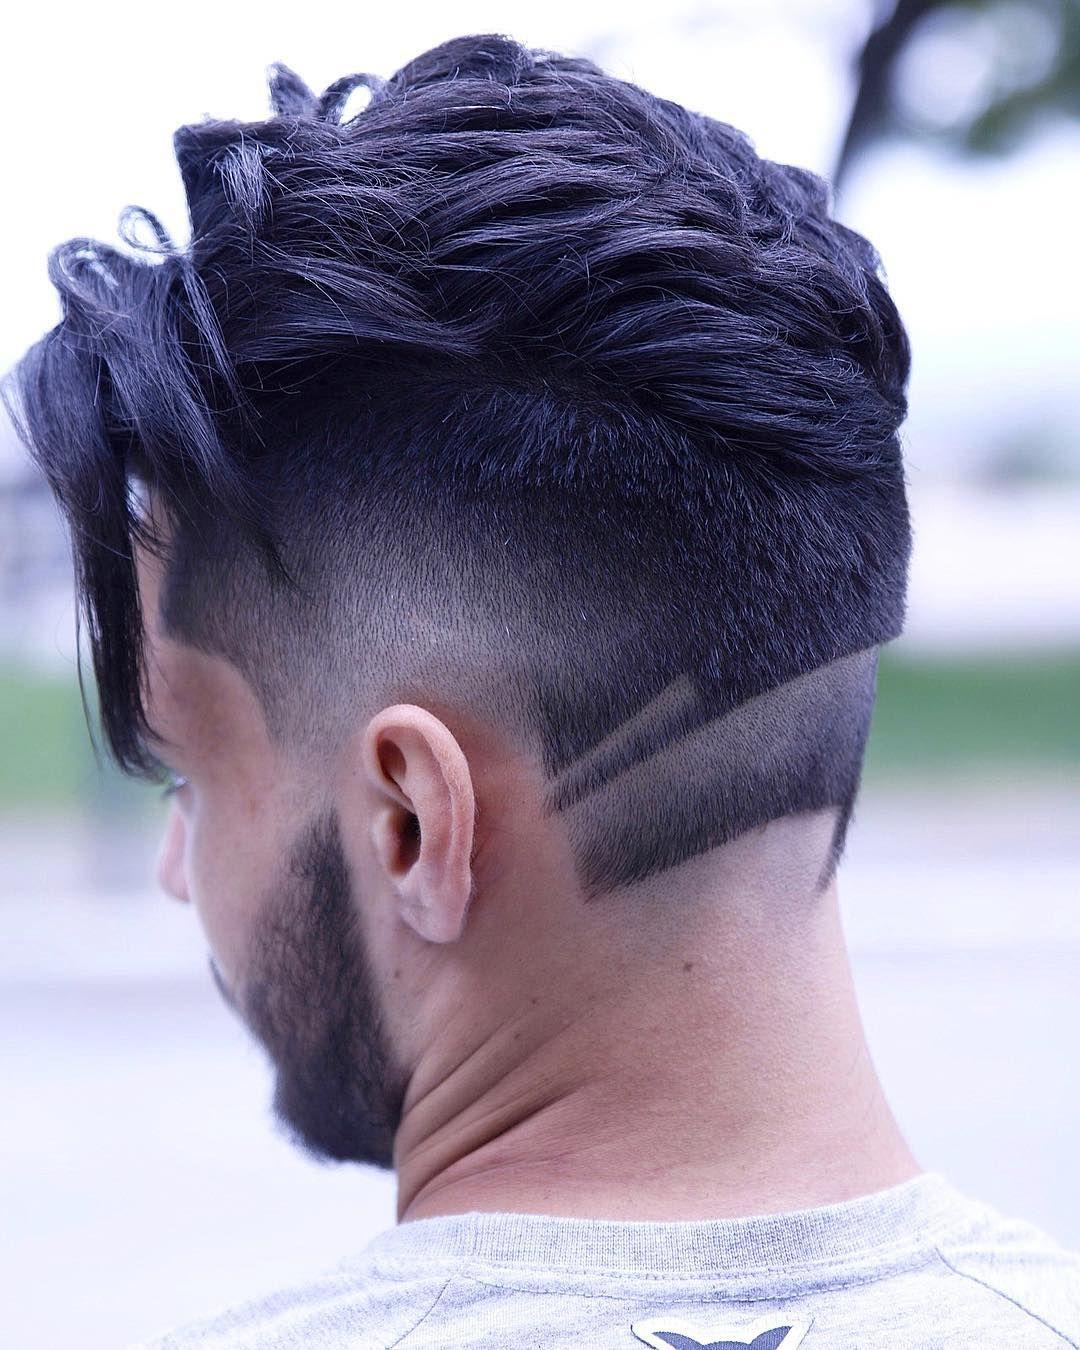 27 cool men's haircuts 2019 | men's haircuts 2018 - the best | hair